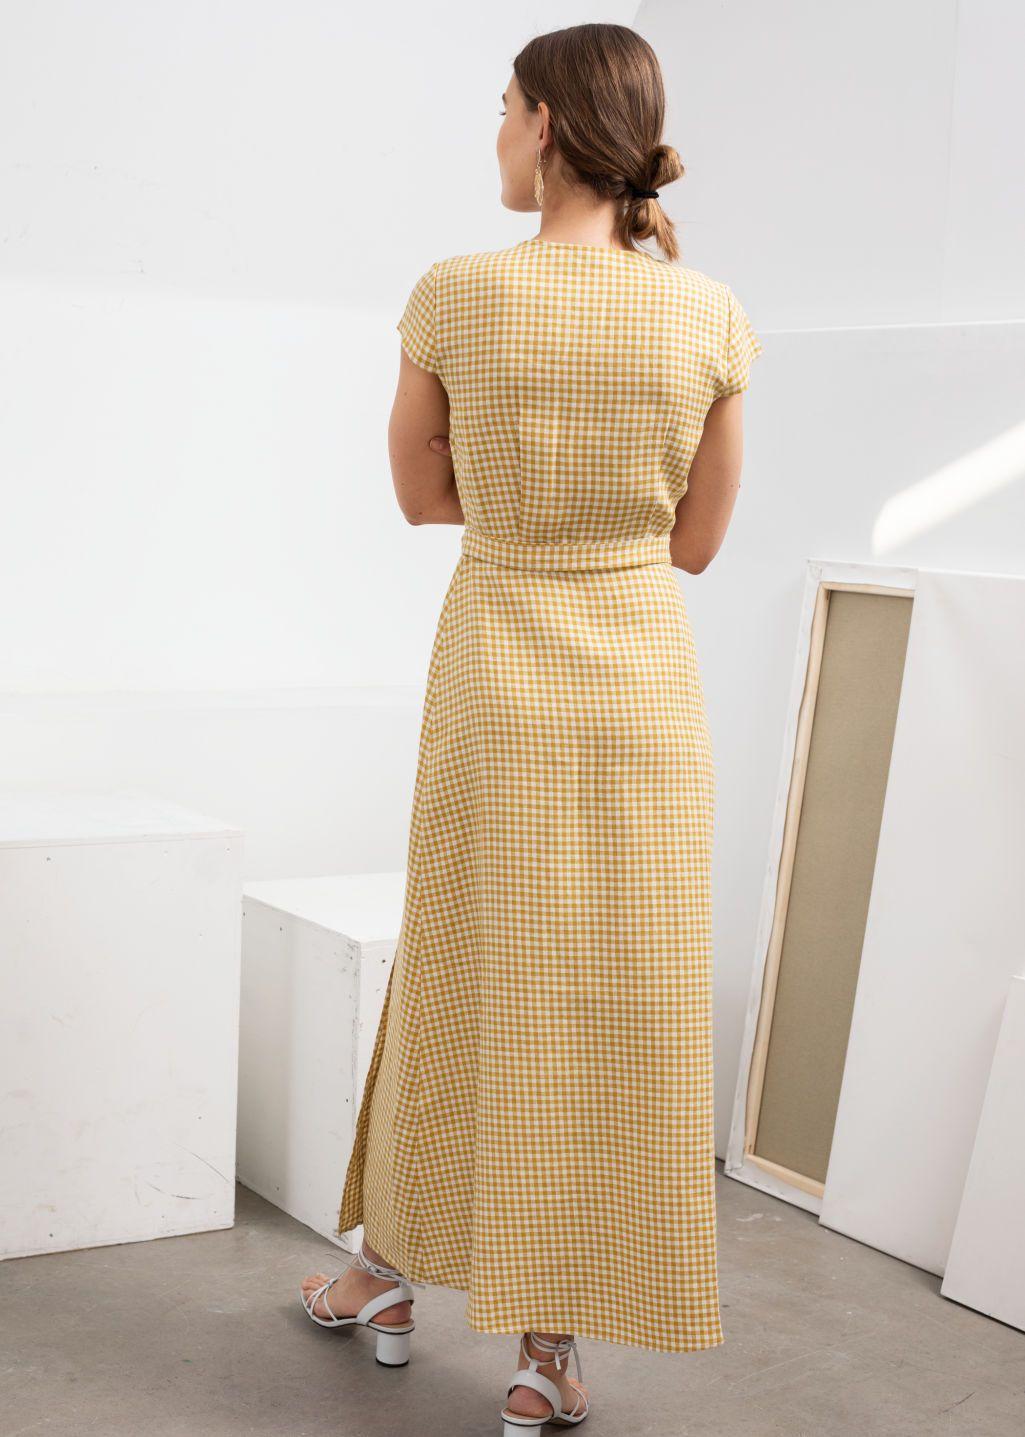 Gingham linen midi wrap dress wrap dress short sleeve